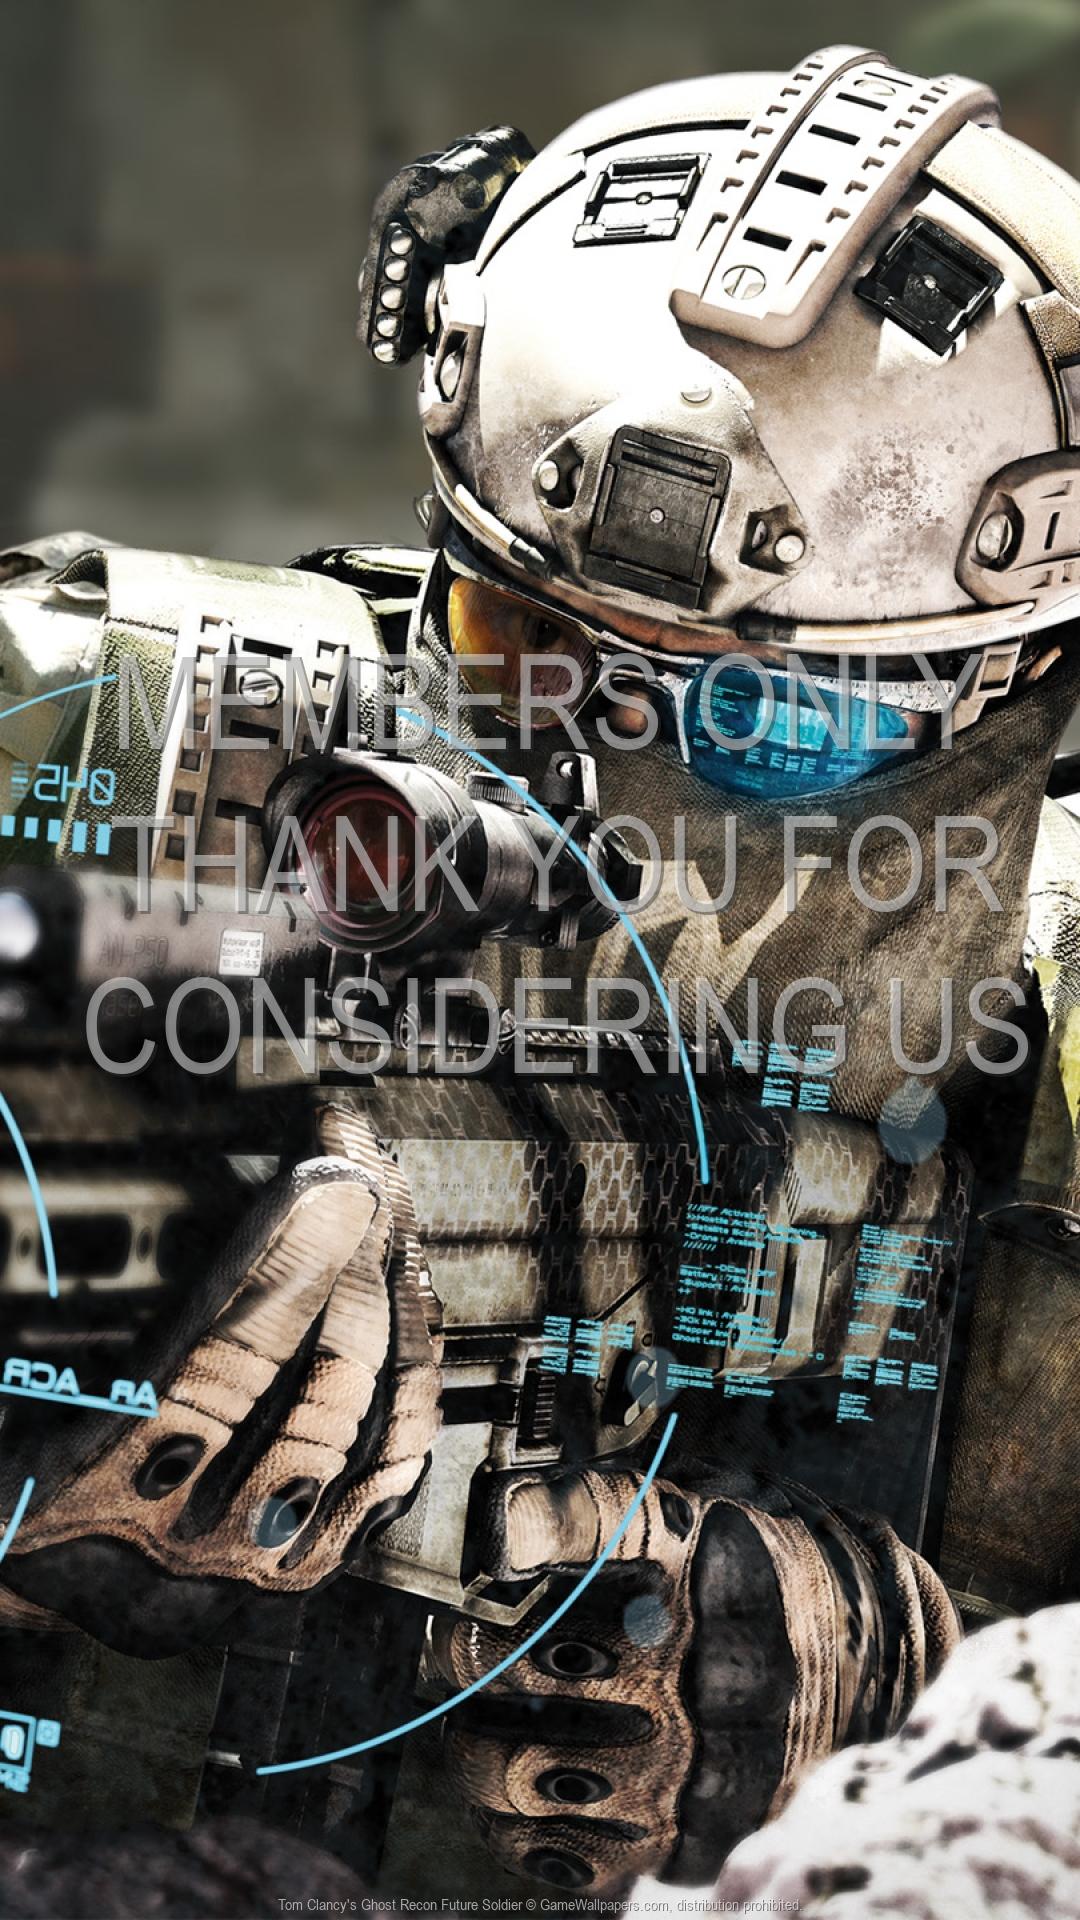 Tom Clancy's Ghost Recon: Future Soldier 1920x1080 Handy Hintergrundbild 03